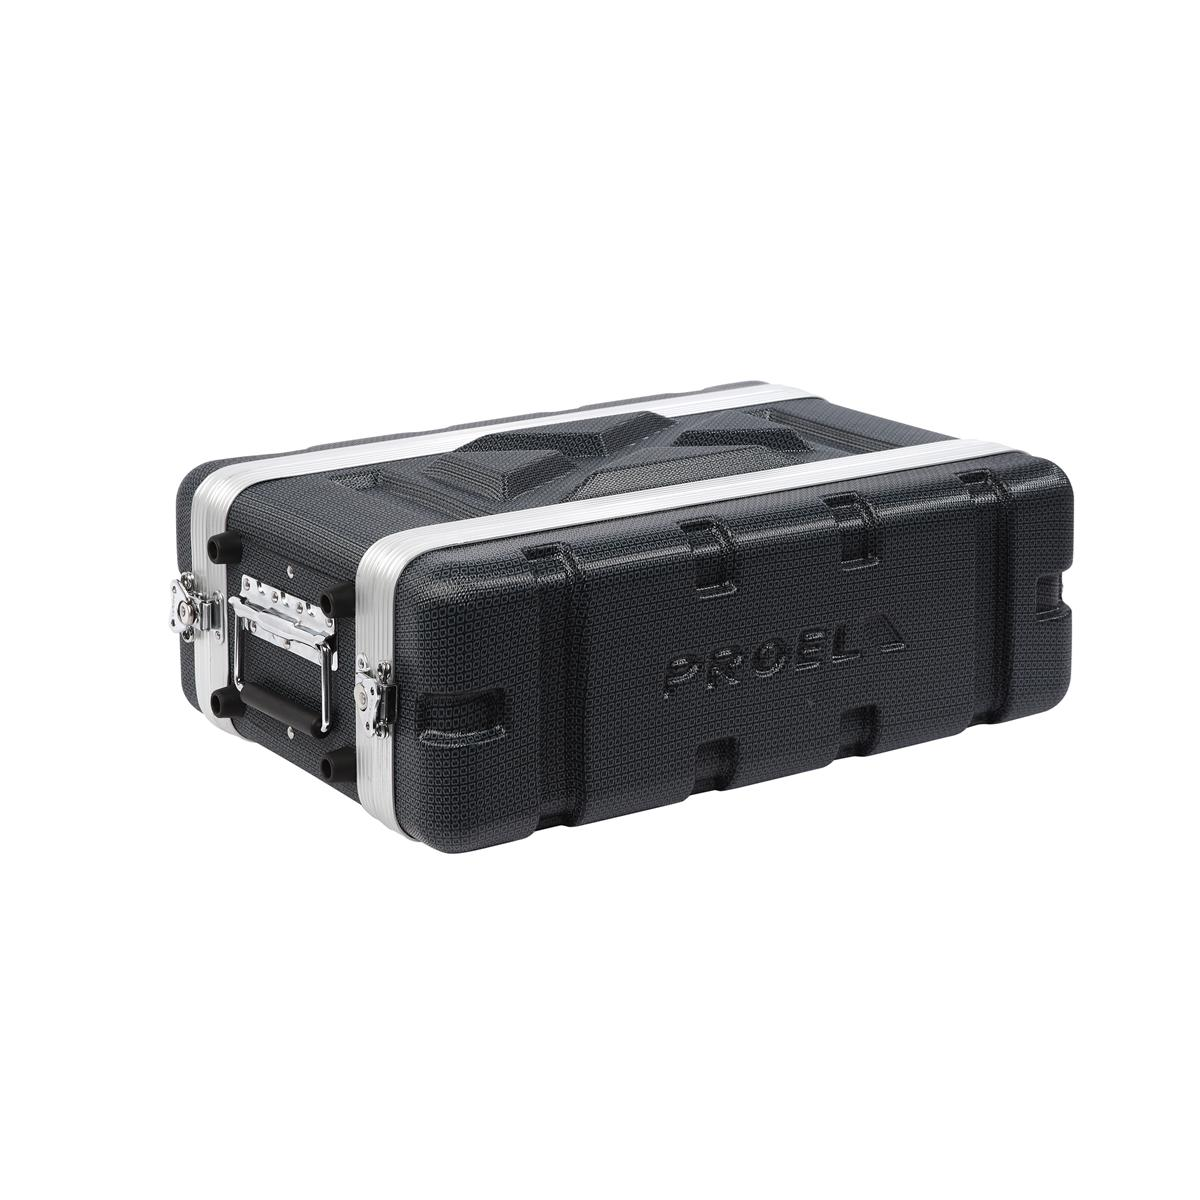 PROEL FORCE FOABSR2US RACK FLIGHT CASE 2 UNITA ABS CORTO - Dj Equipment Accessori - Borse e Custodie DJ